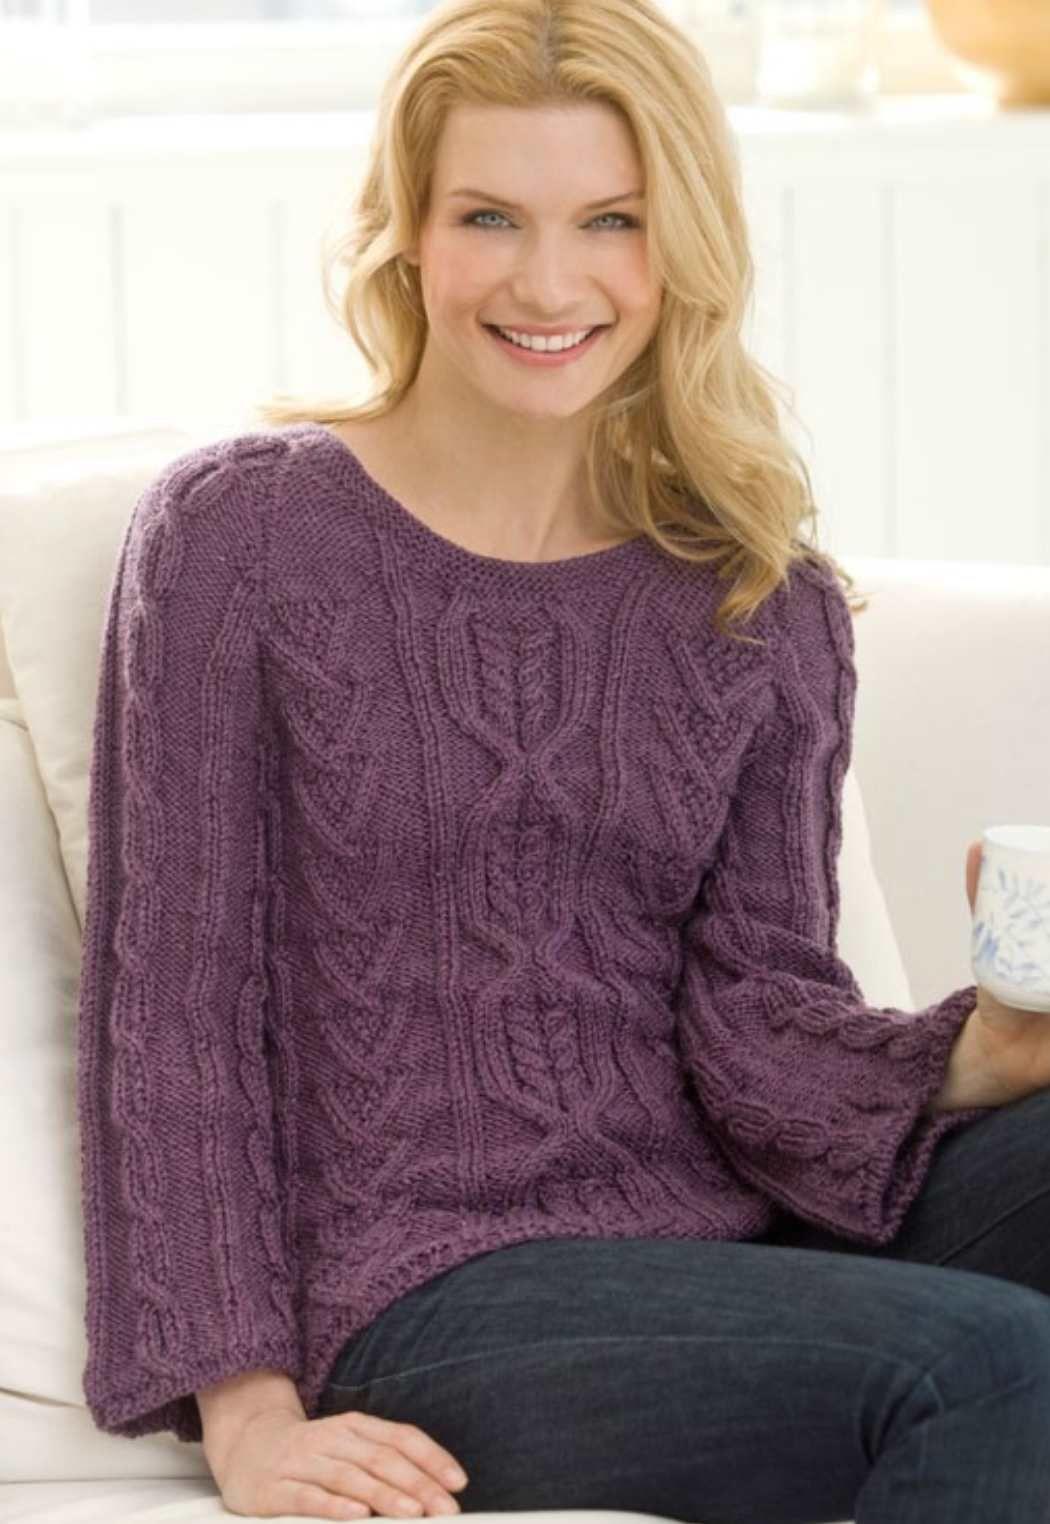 New Aran Sweater Free Knitting Pattern | Aran sweaters, Knitting ...